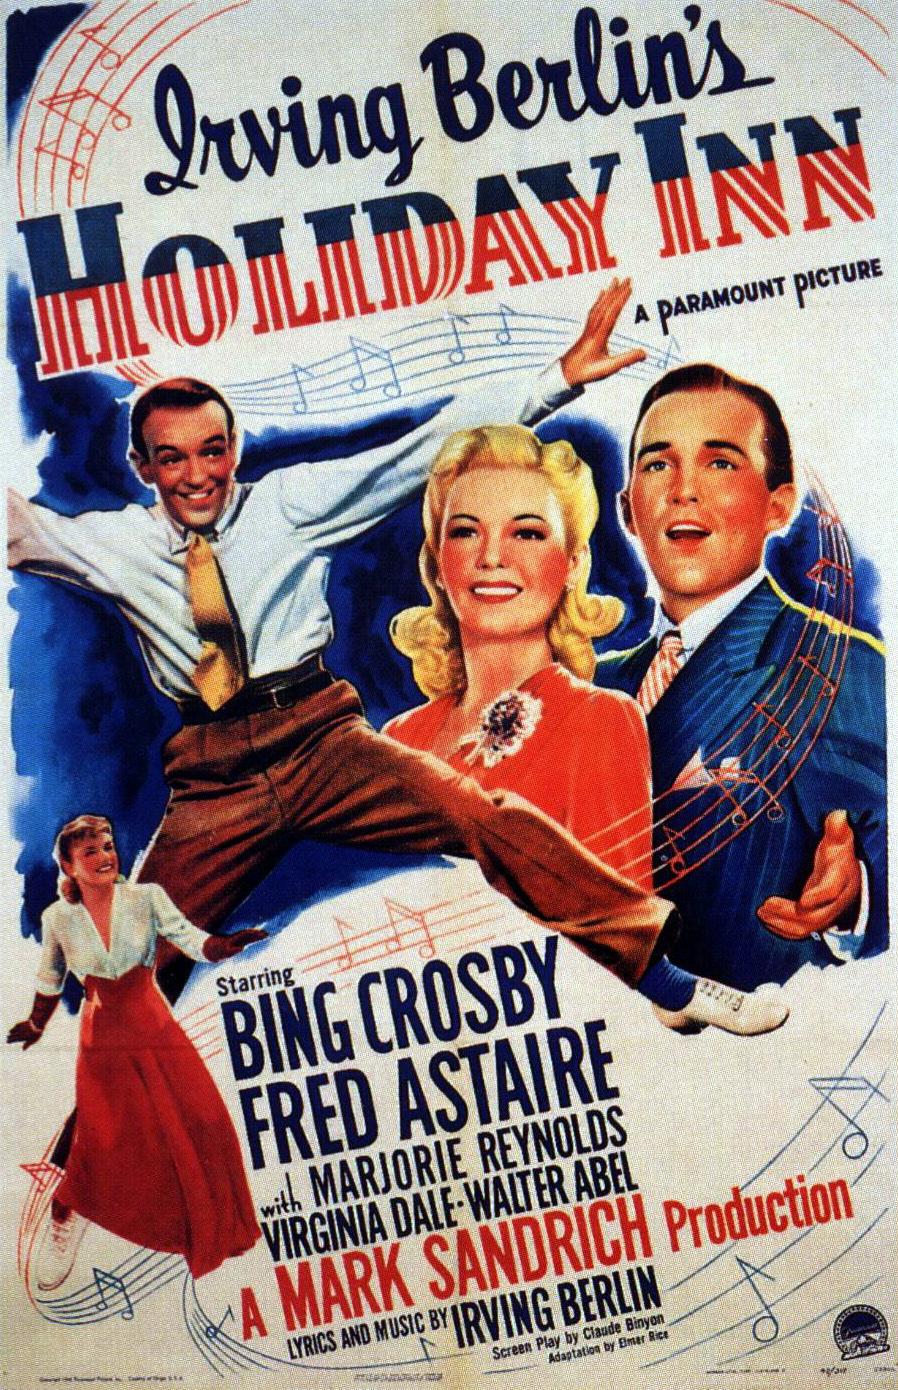 Crosby-Astaire-Holiday-Inn